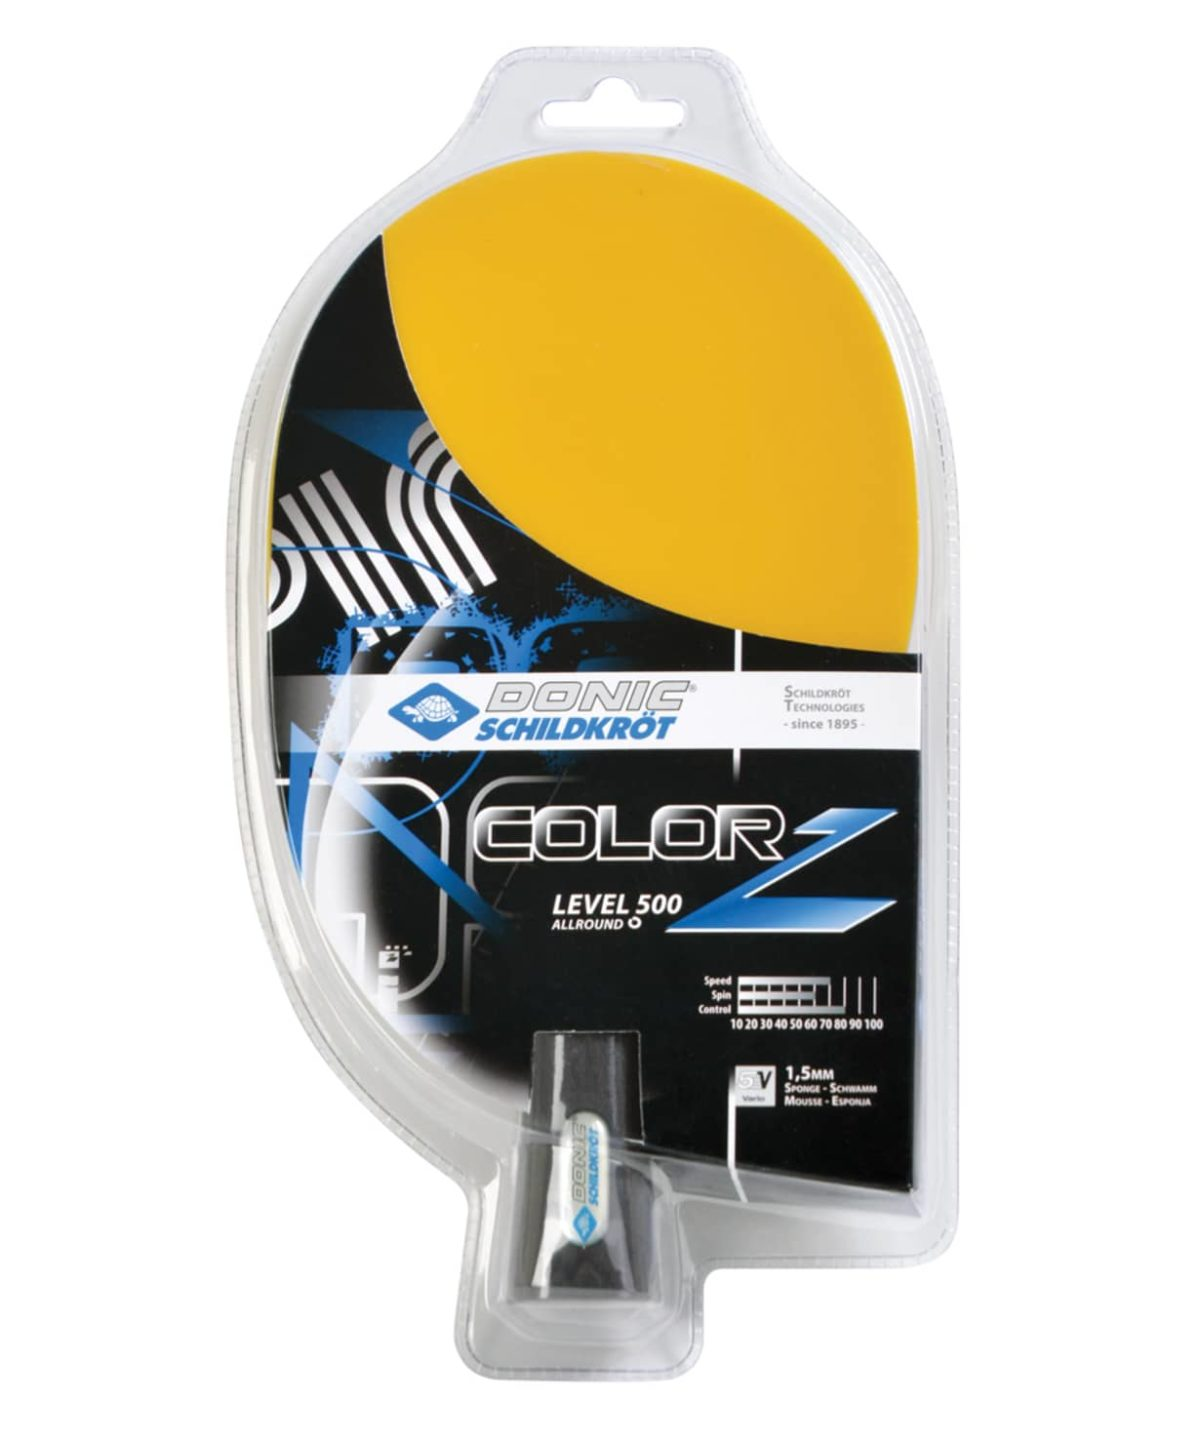 DONIC Schildkrot Color Z Yellow Ракетка для настольного тенниса  18115 - 1